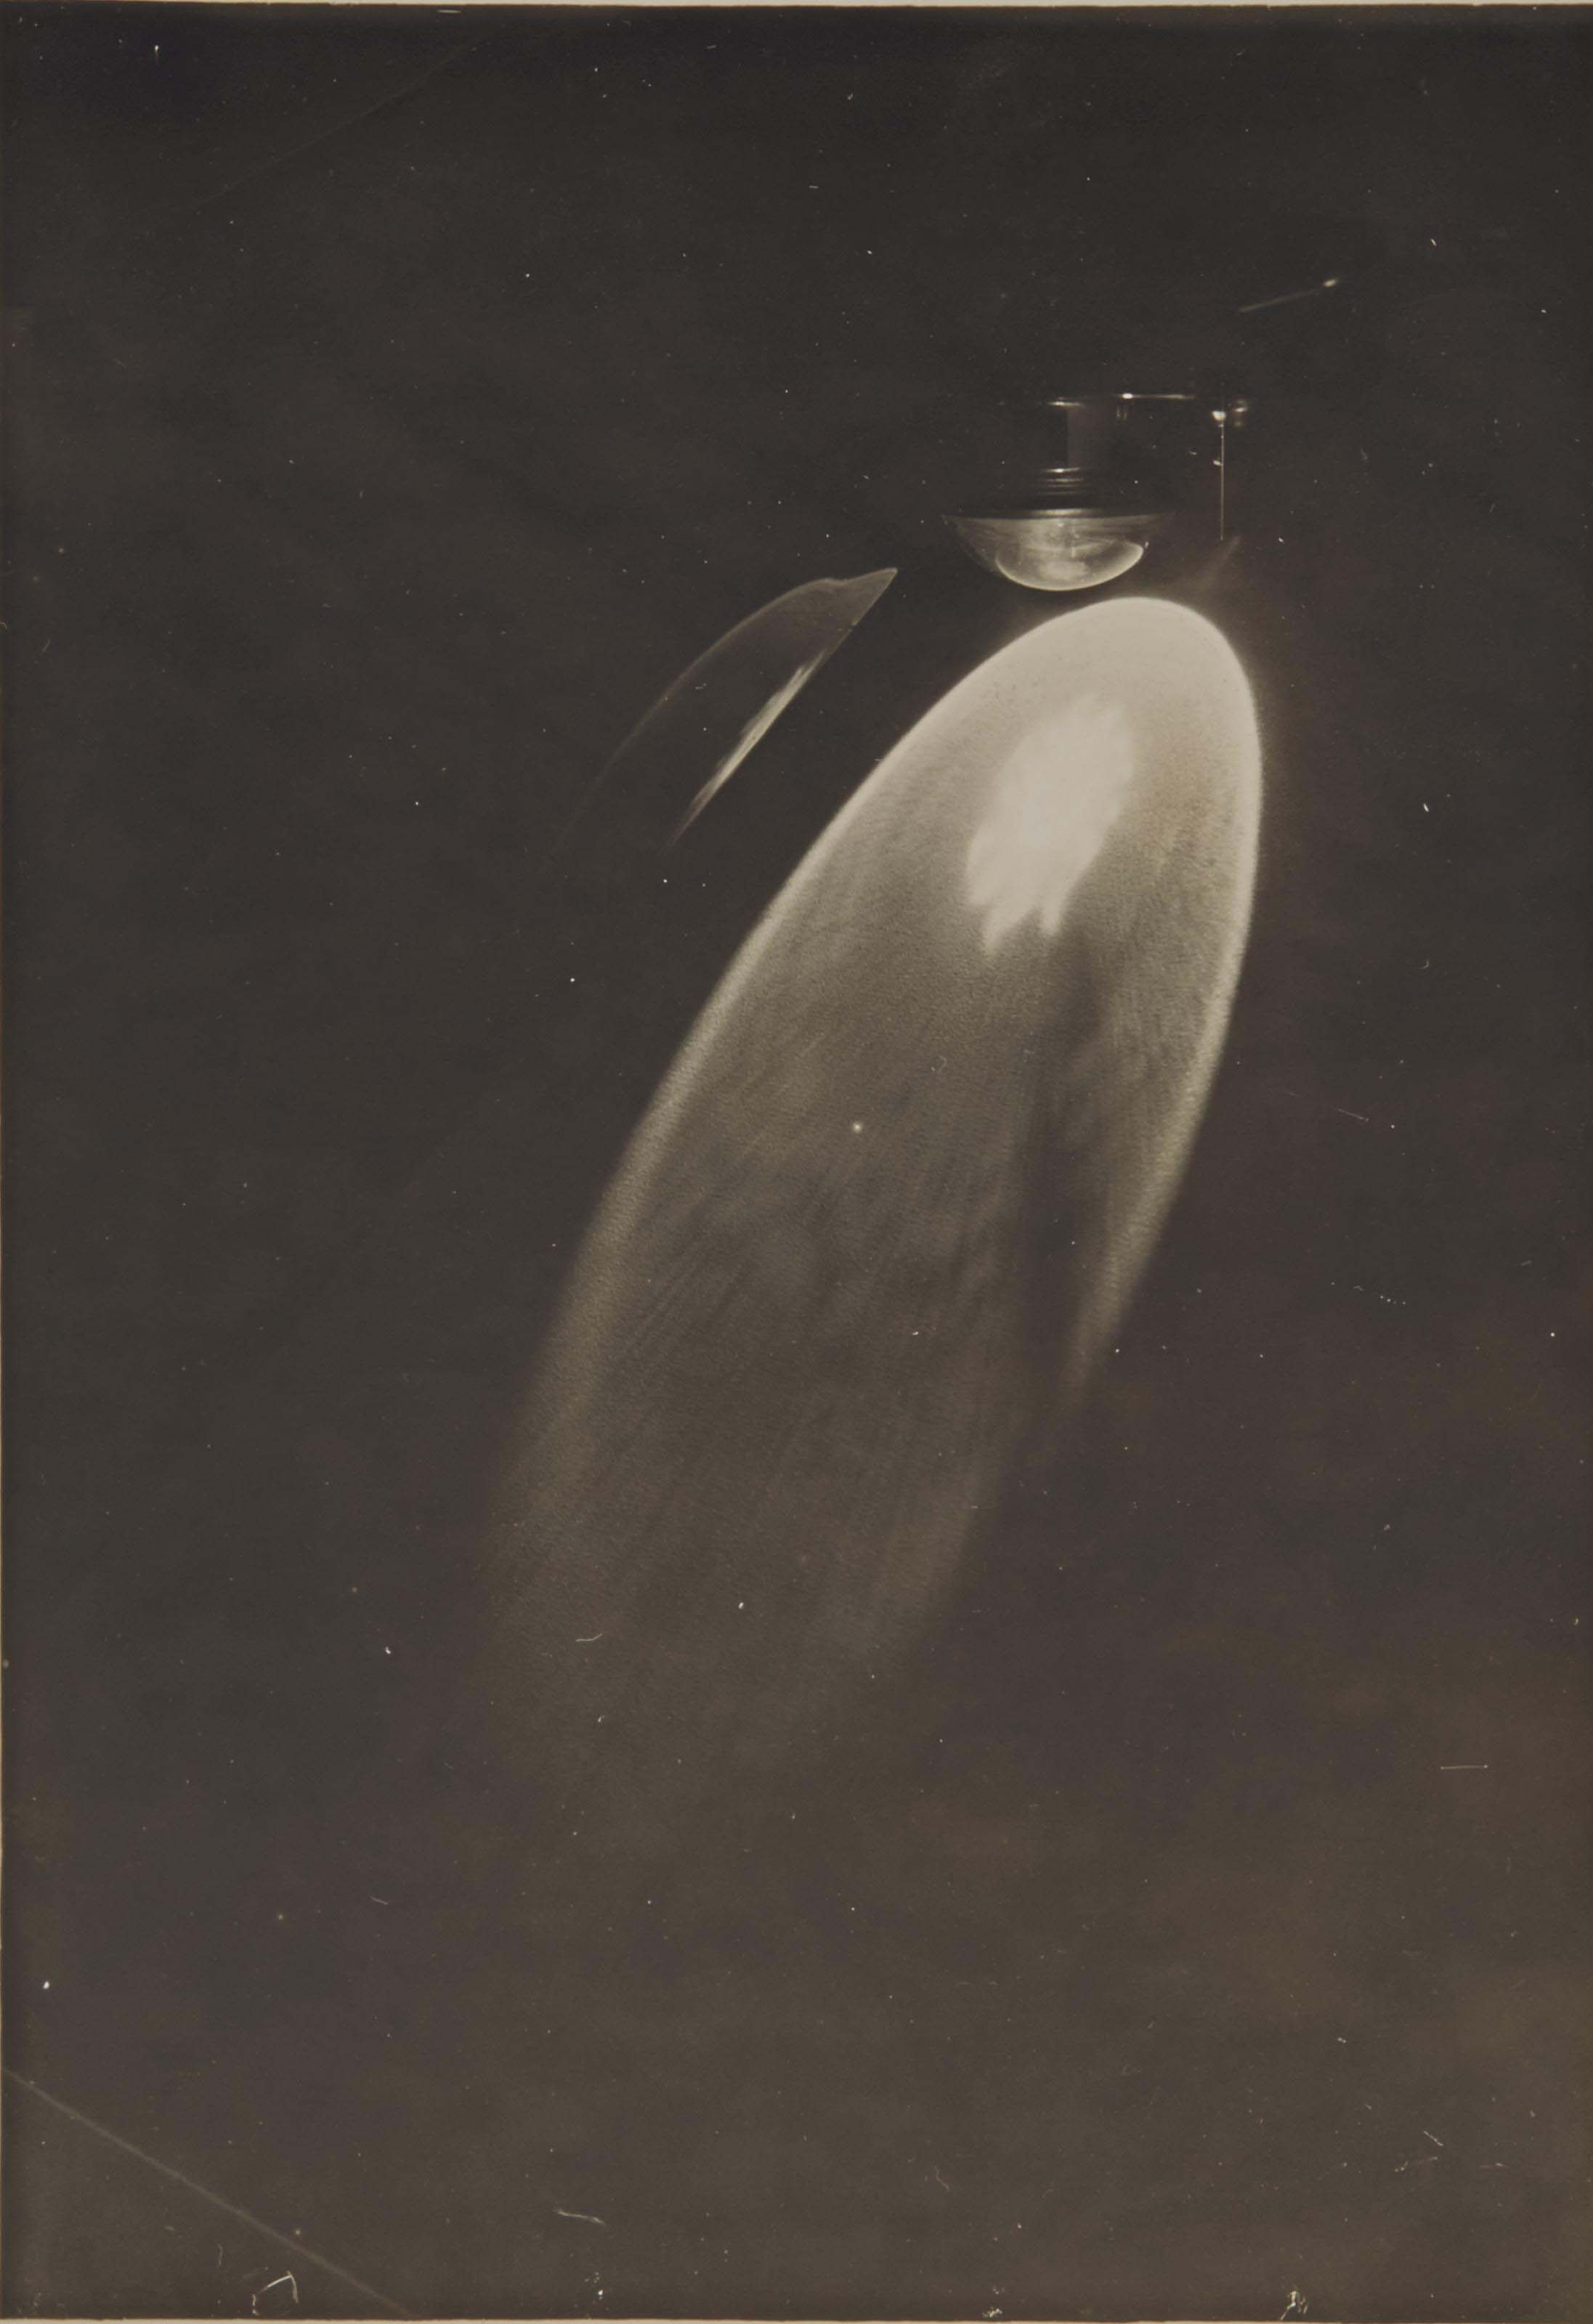 PIET ZWART (1885-1977)